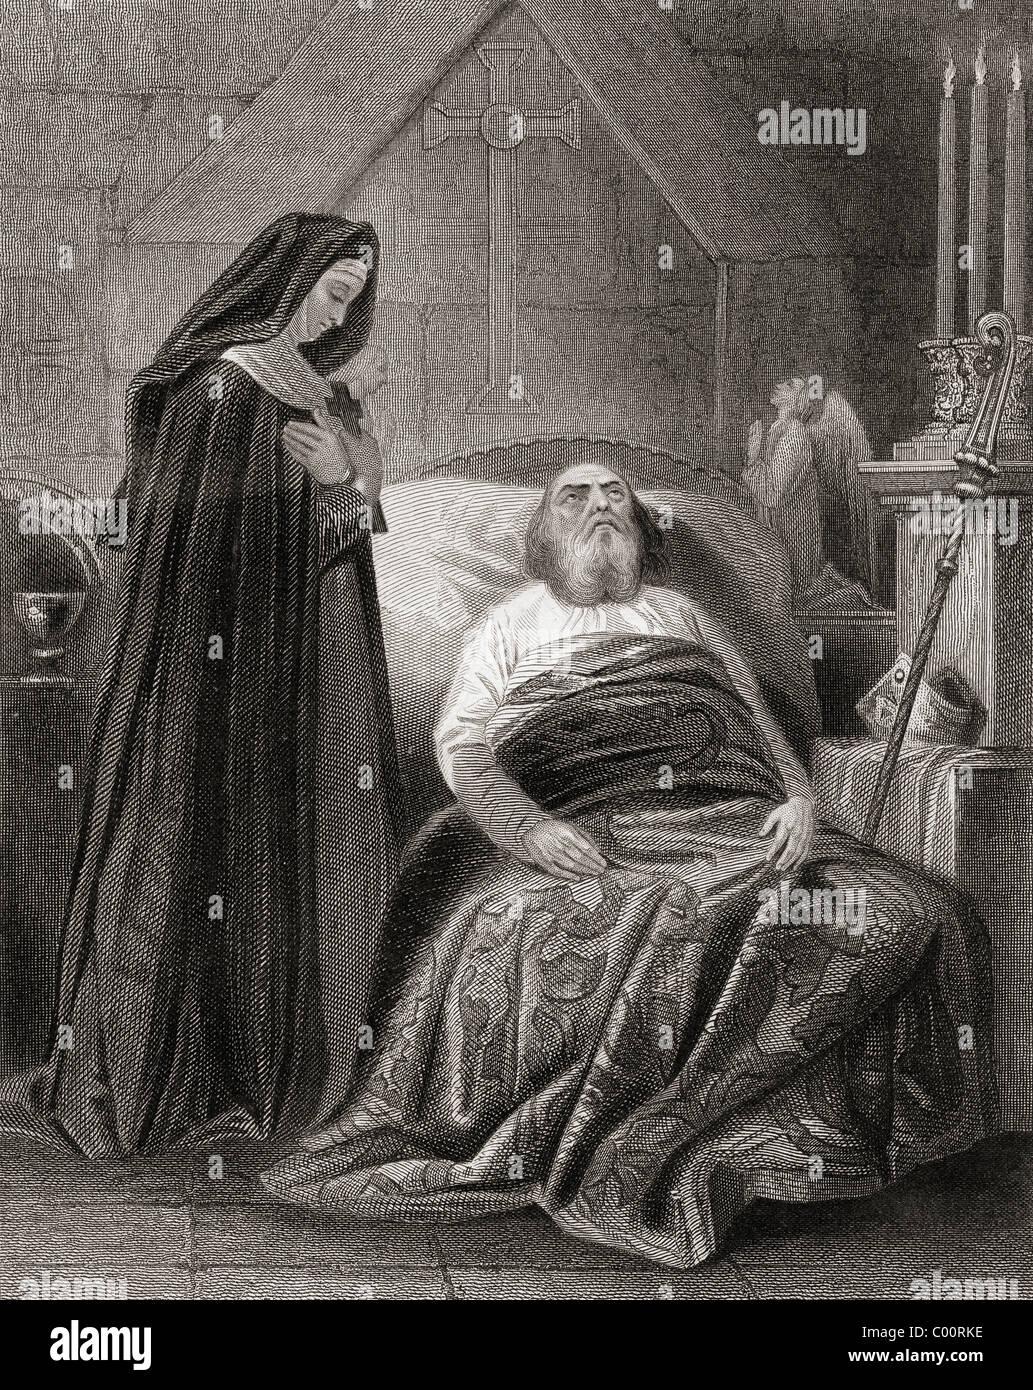 Tod von St. Patrick. Stockbild